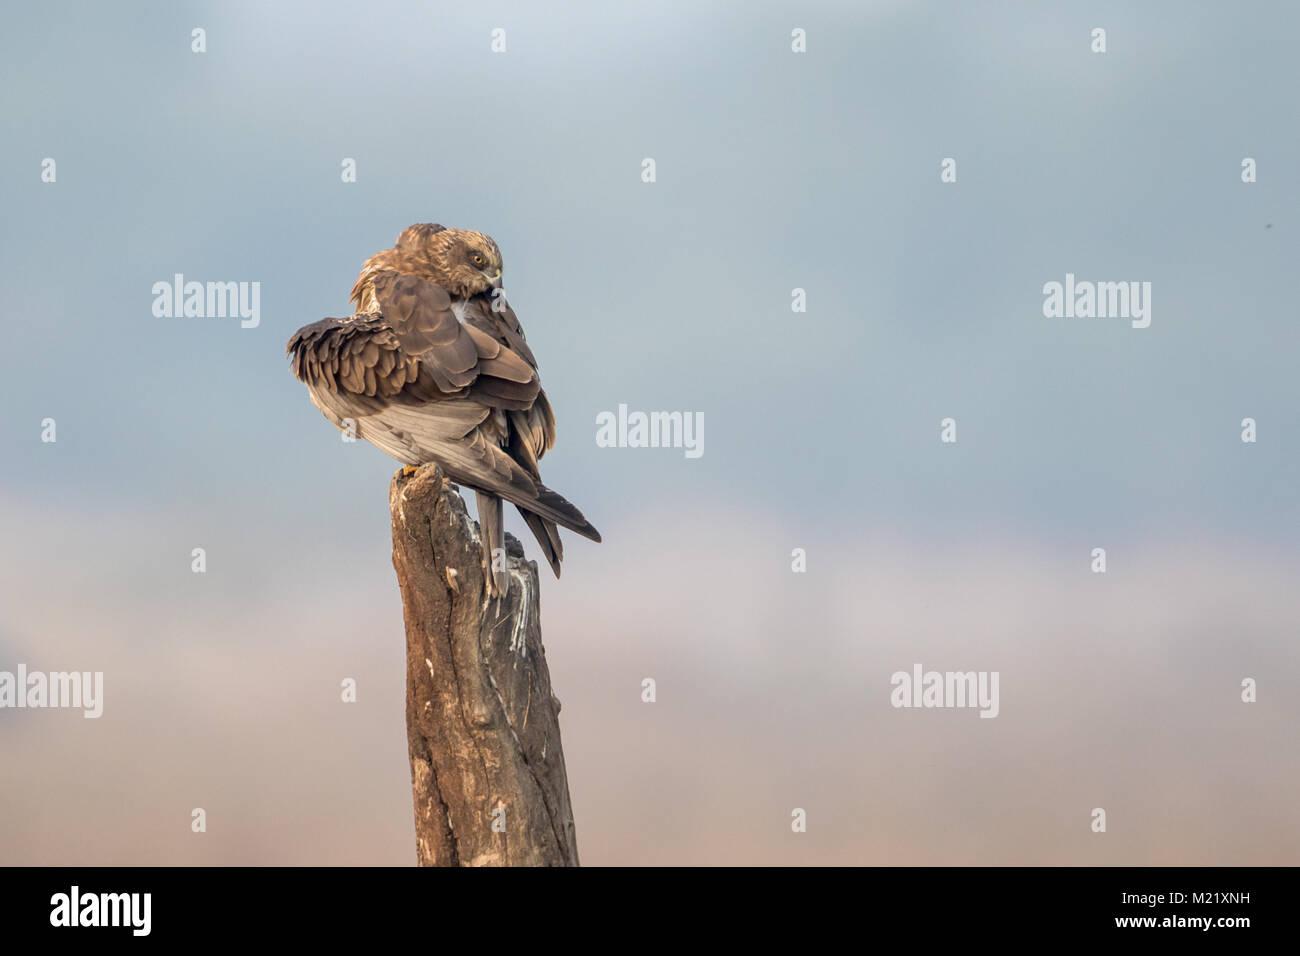 The western marsh harrier (Circus aeruginosus) bird preening at Bharatpur Bird Sanctuary in Rajasthan, India - Stock Image